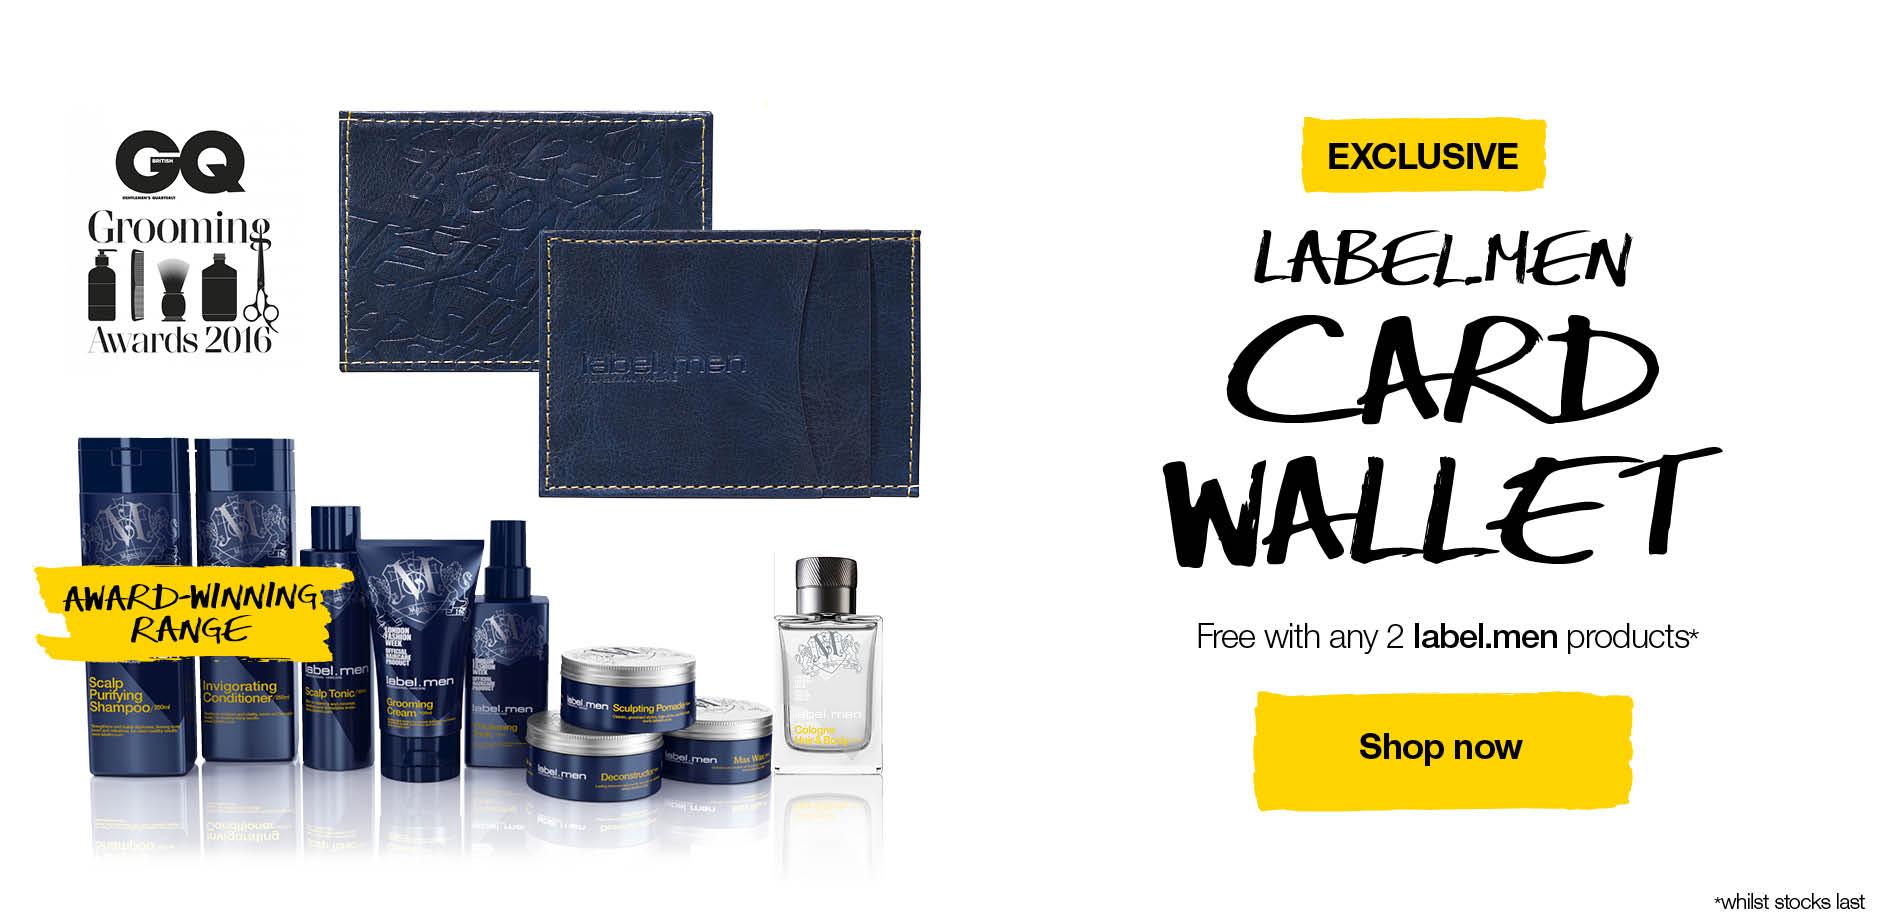 label.men wallet Summer 2016 promo